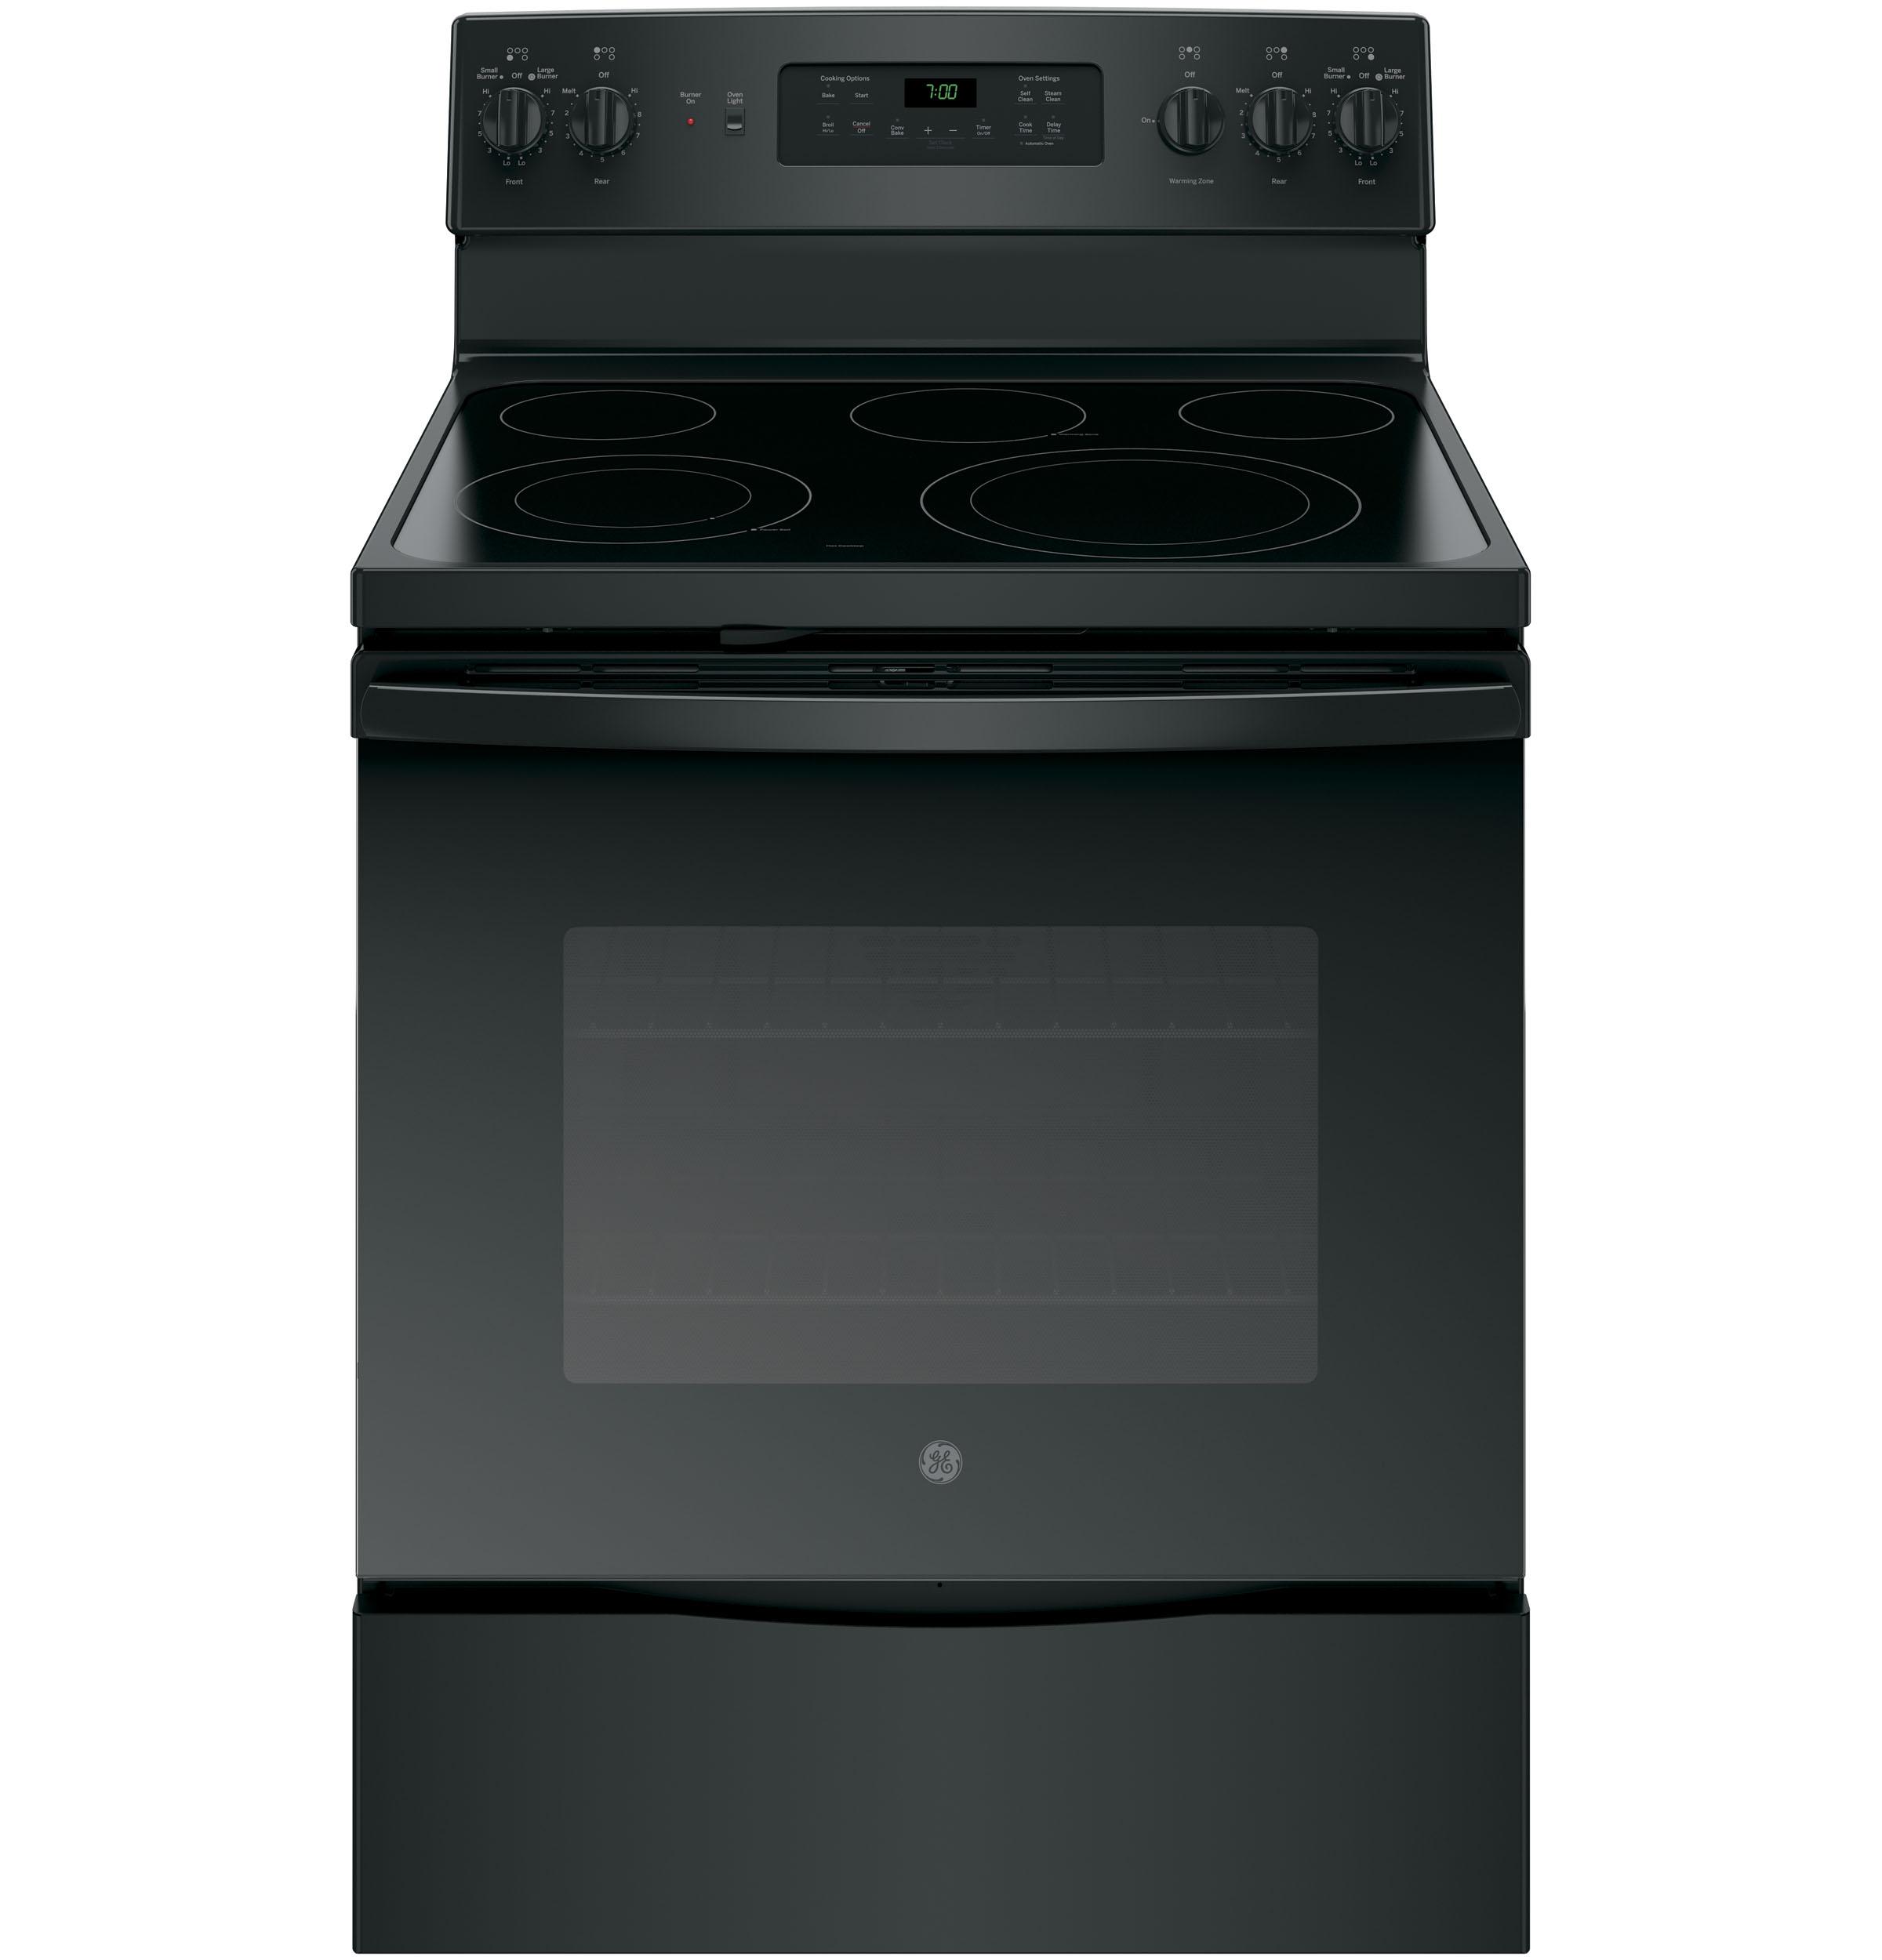 "GE Appliances GE Electric Ranges 30"" Electric Convection Range - Item Number: JB700DJBB"